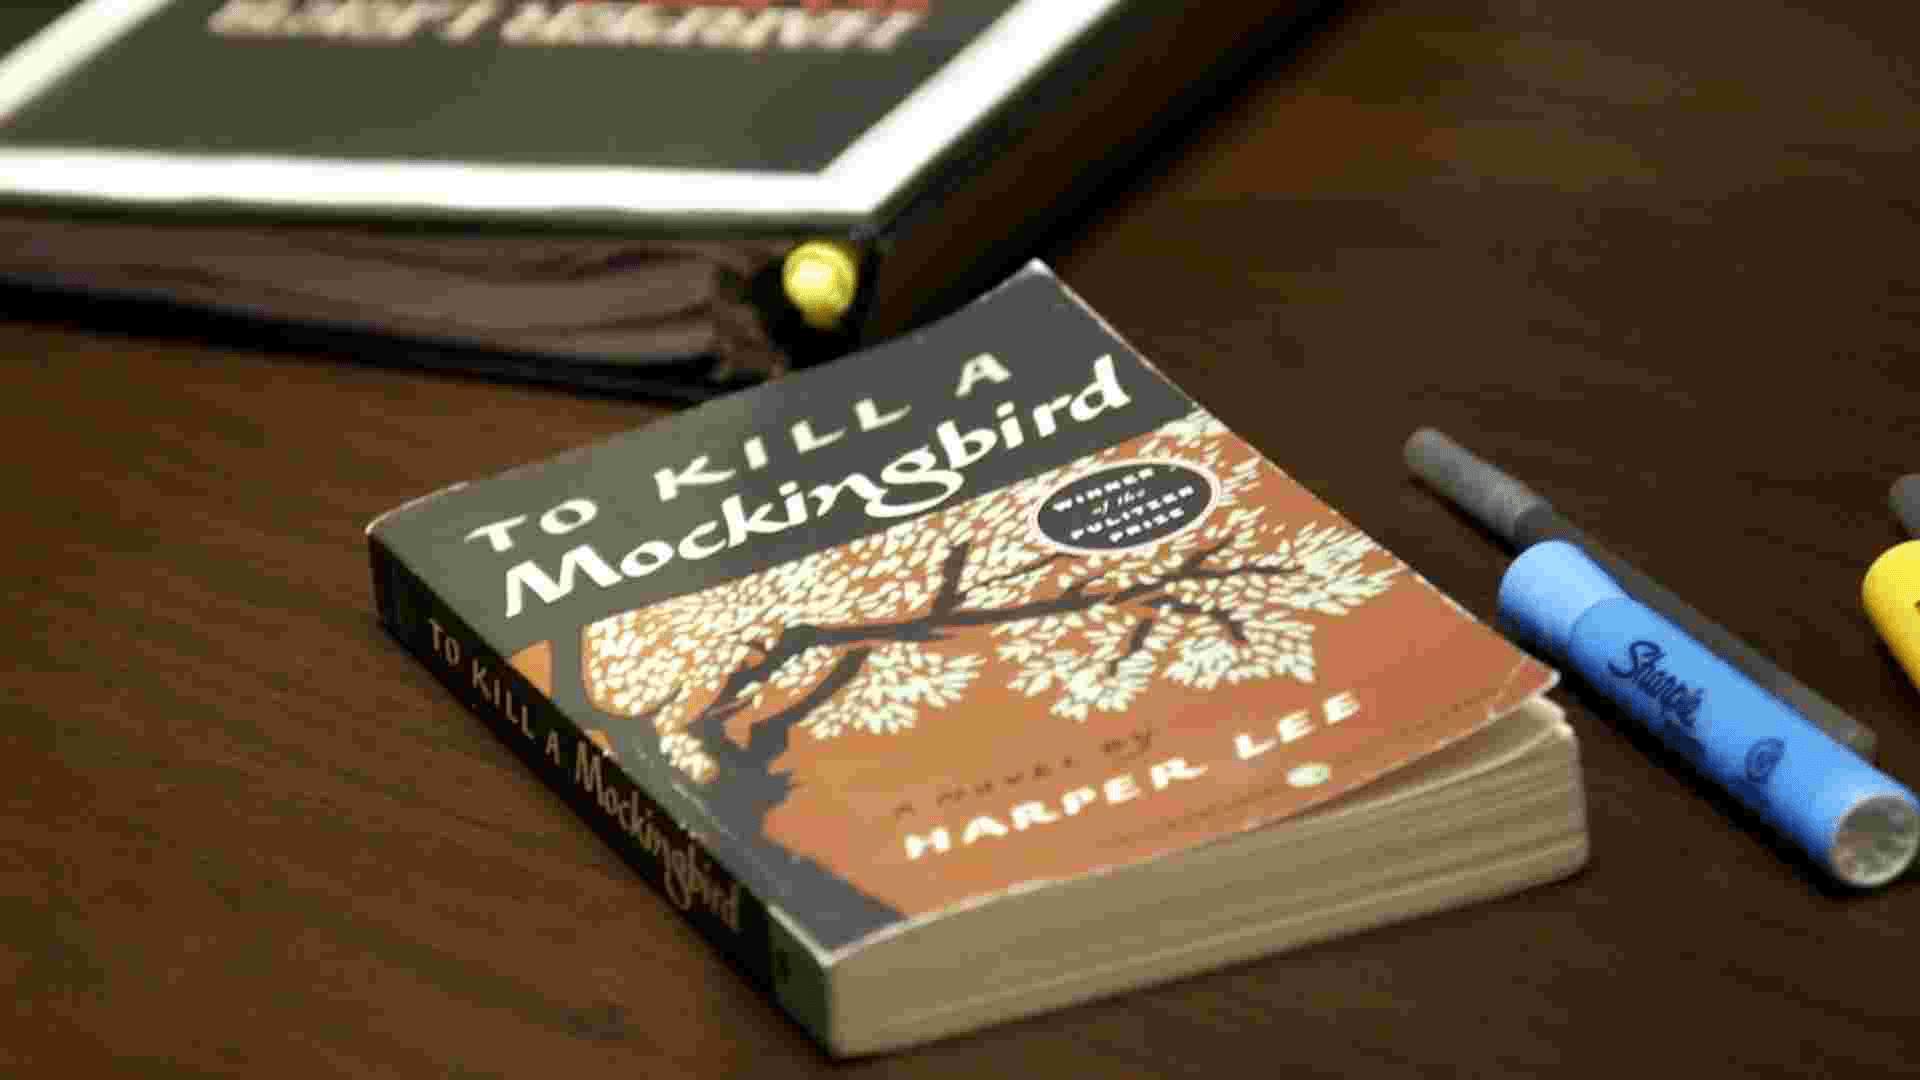 Contoh Teks Ulasan Singkat Film, Novel, Buku, Cerpen